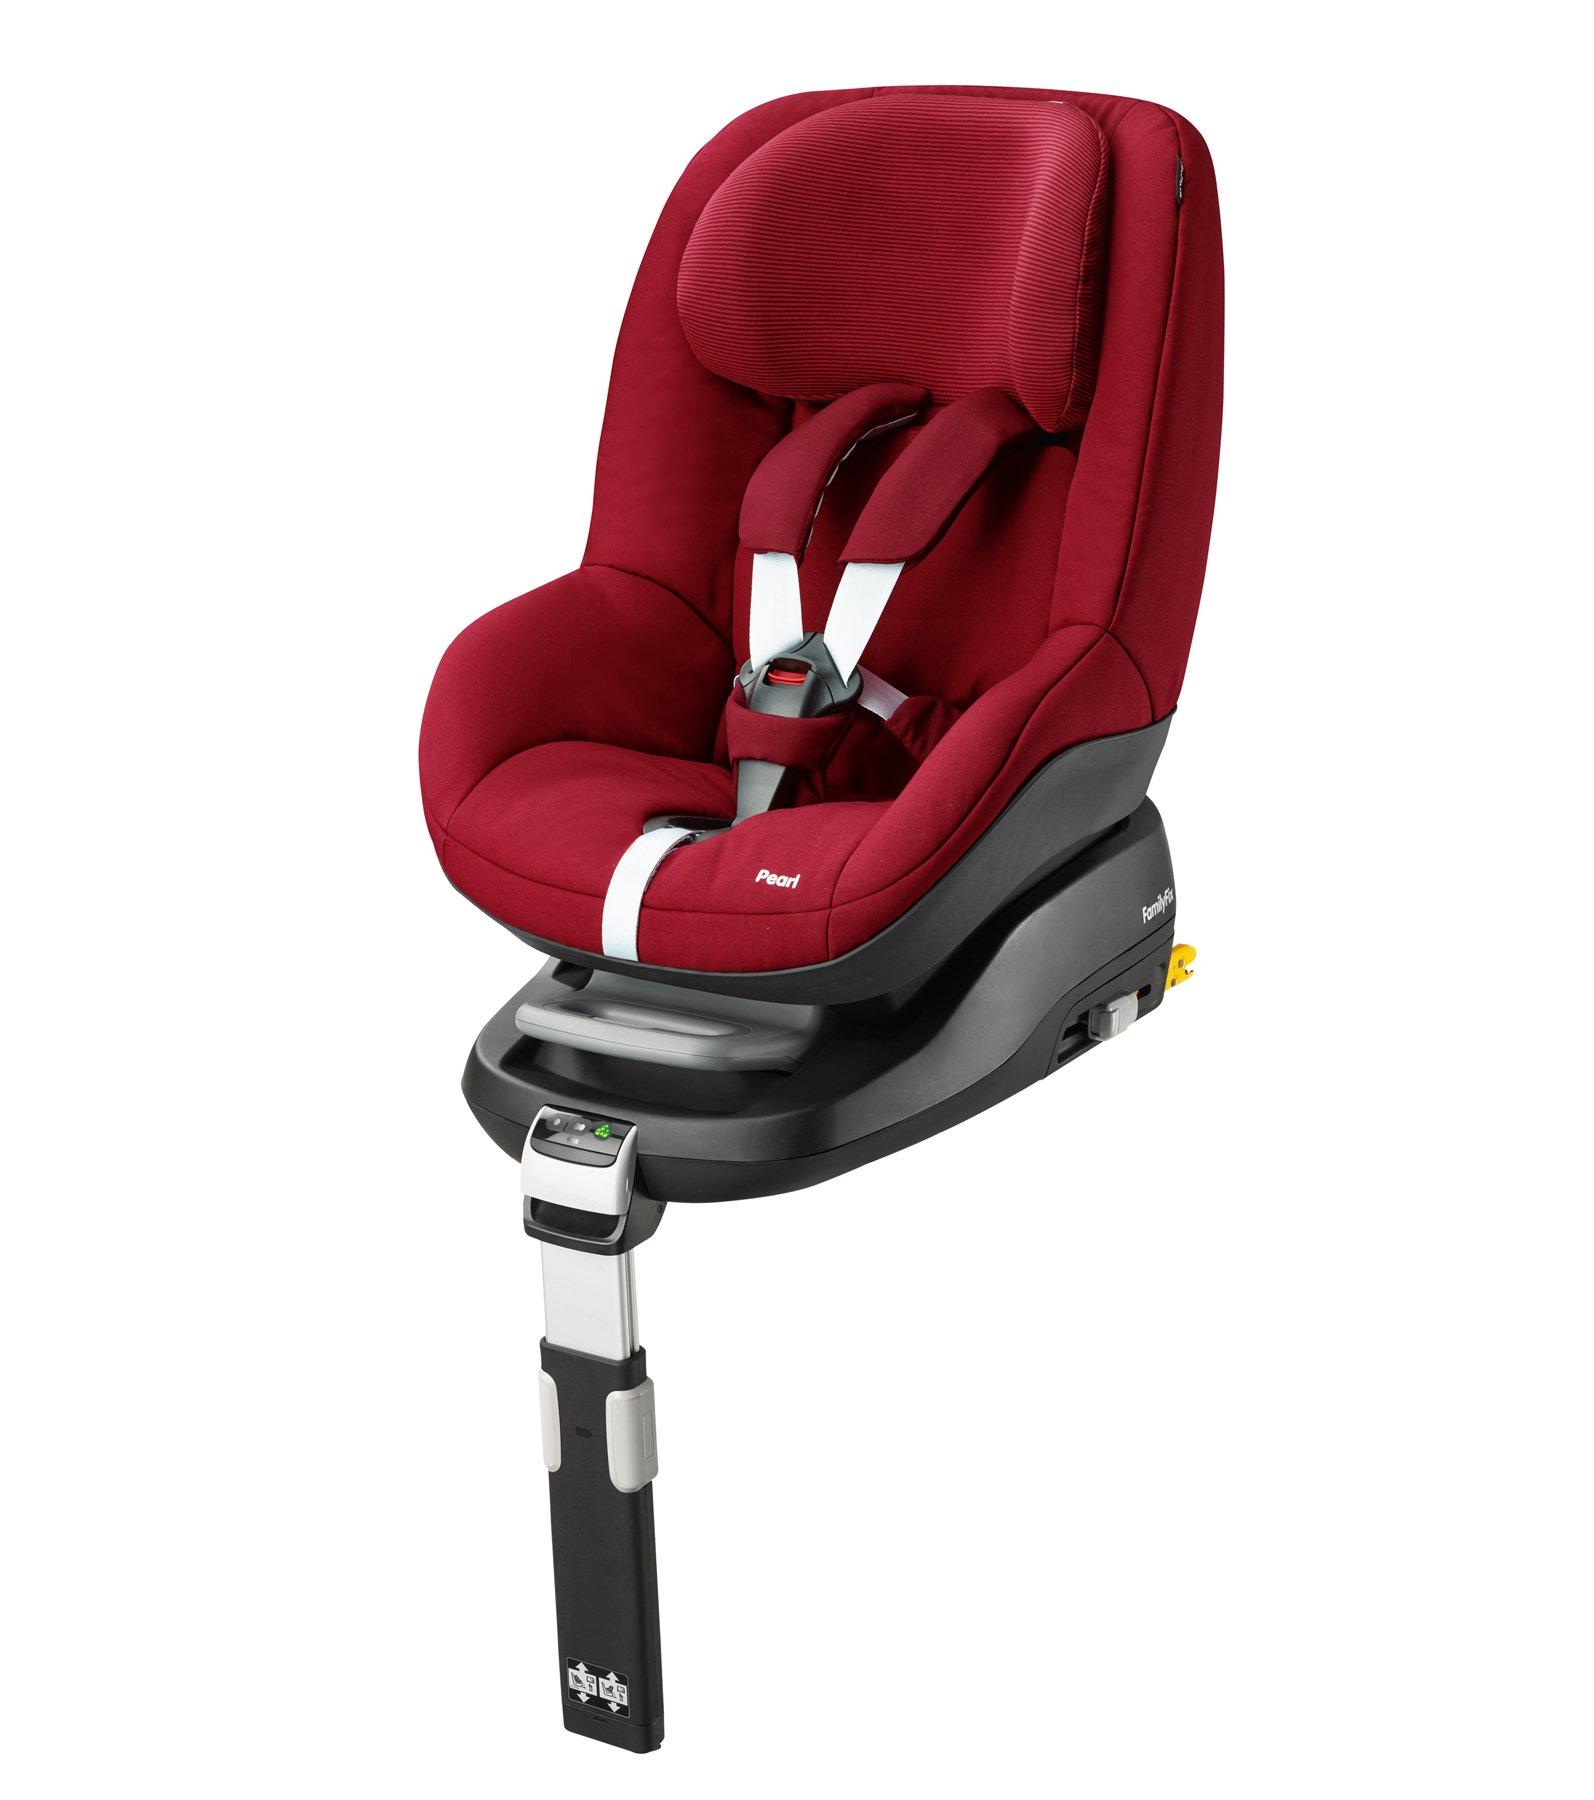 Maxi-Cosi 63409641Pearl Children's Seat, Group 1, 9-18kg Maxi-Cosi  67